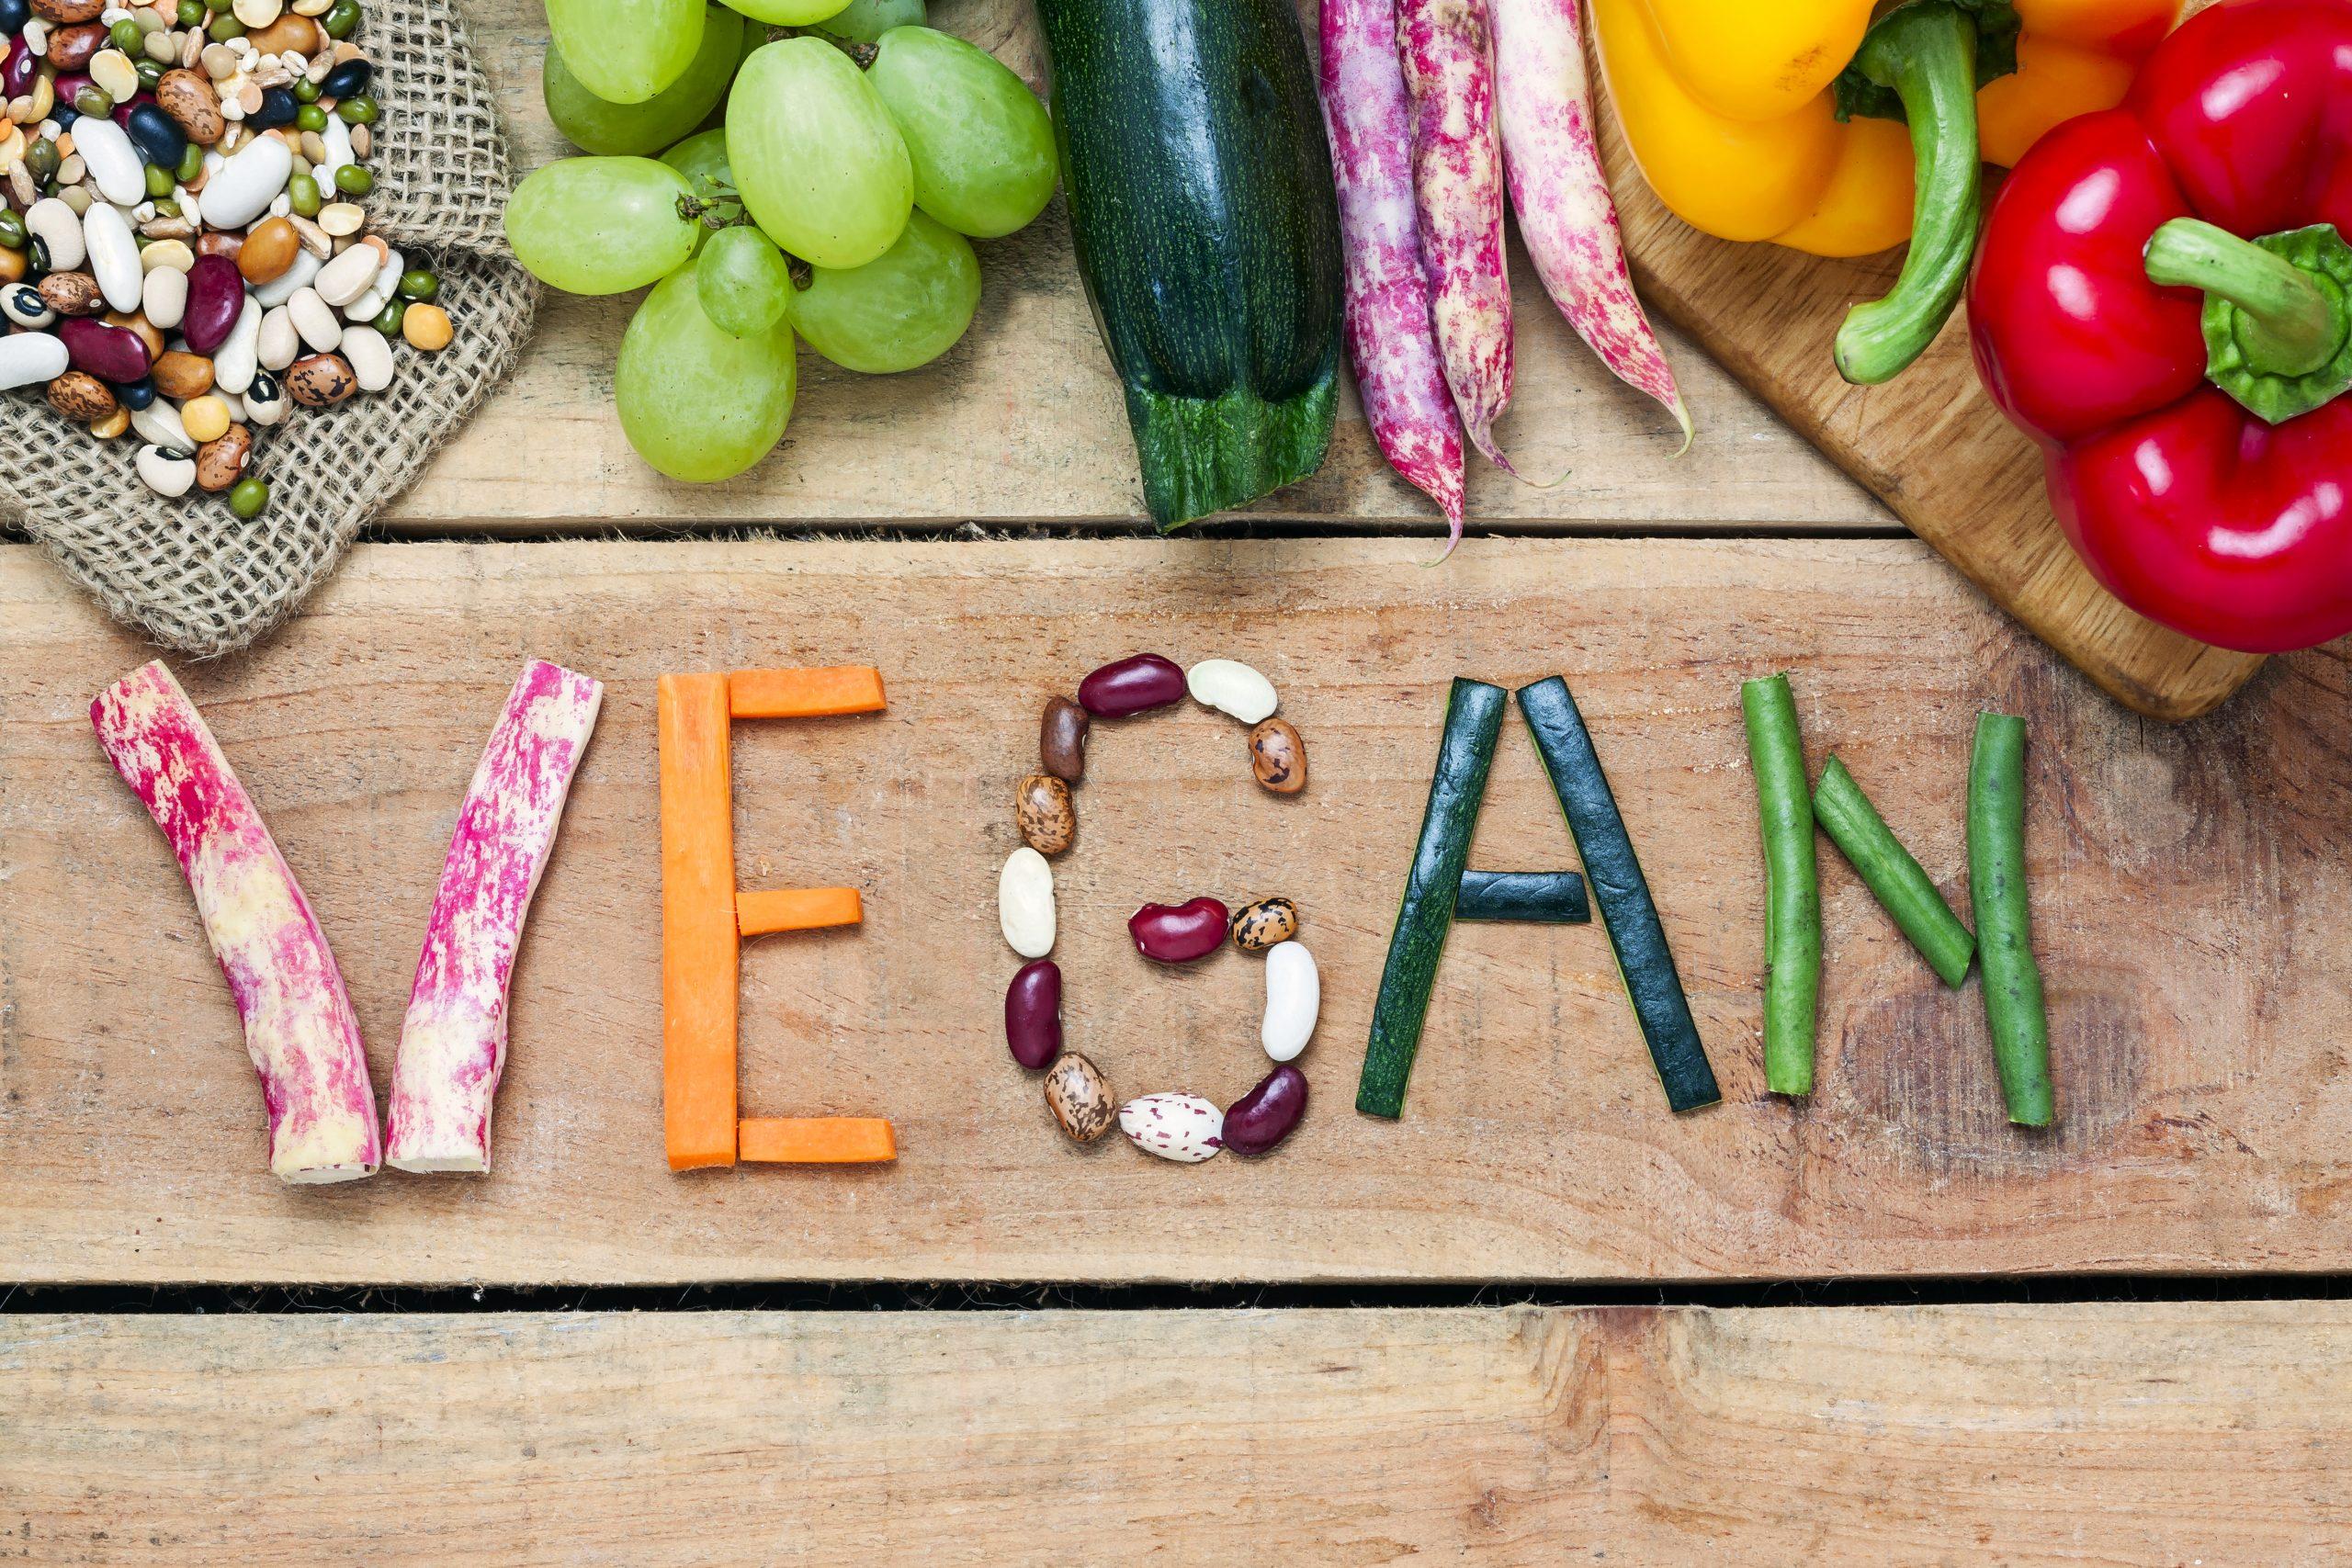 peta hottest vegan over 50 finalists